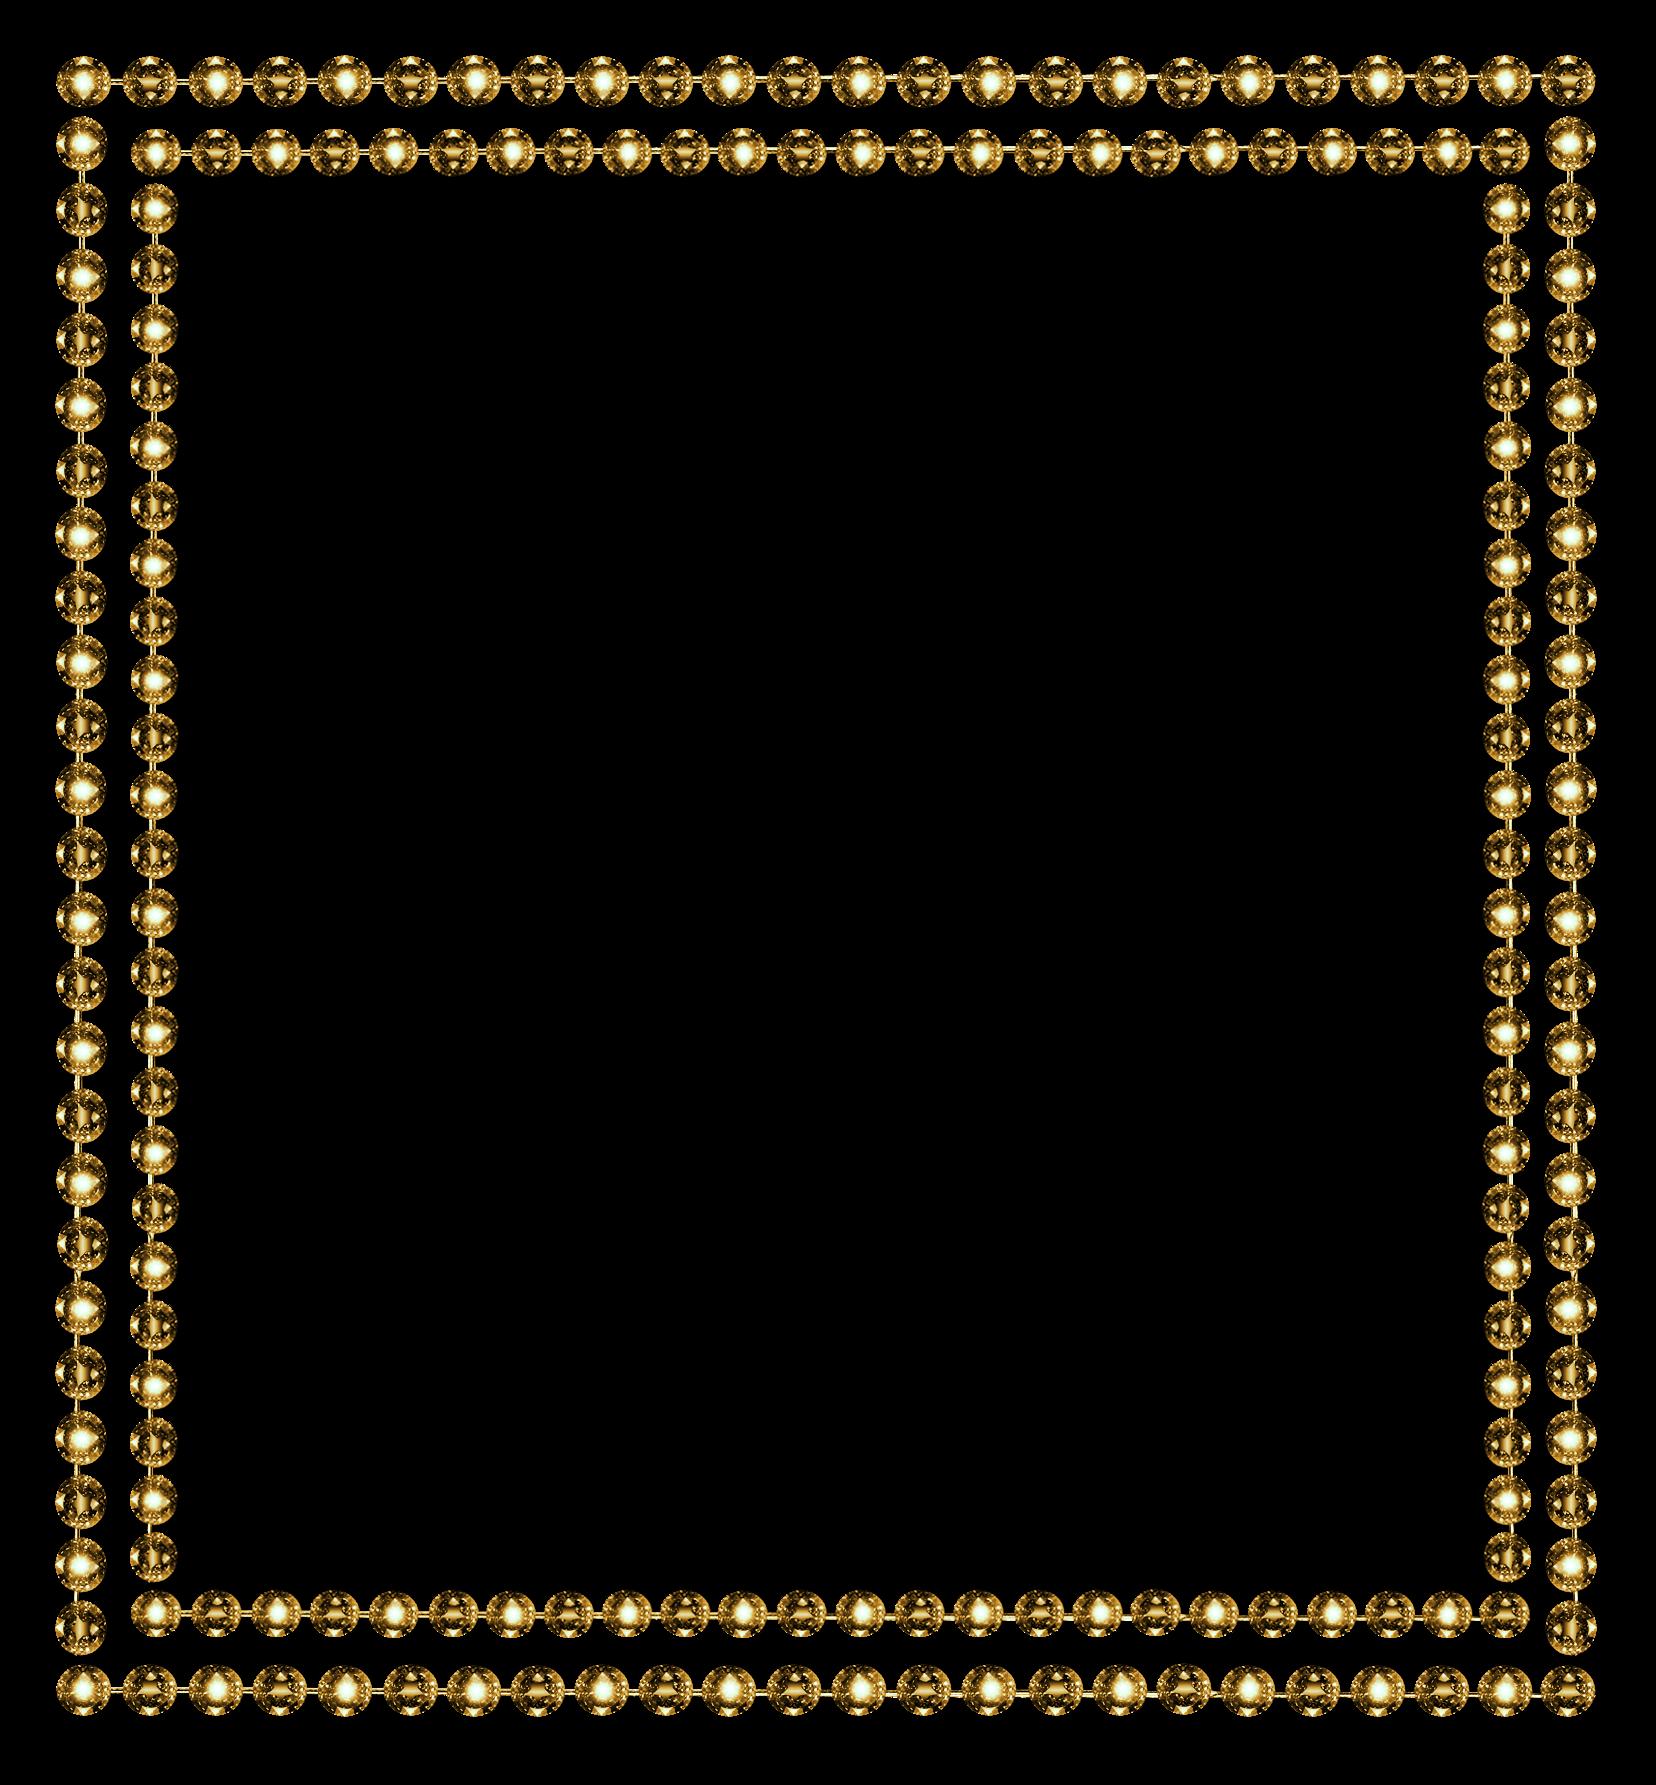 Diamond clipart square. Gemstone clip art gold